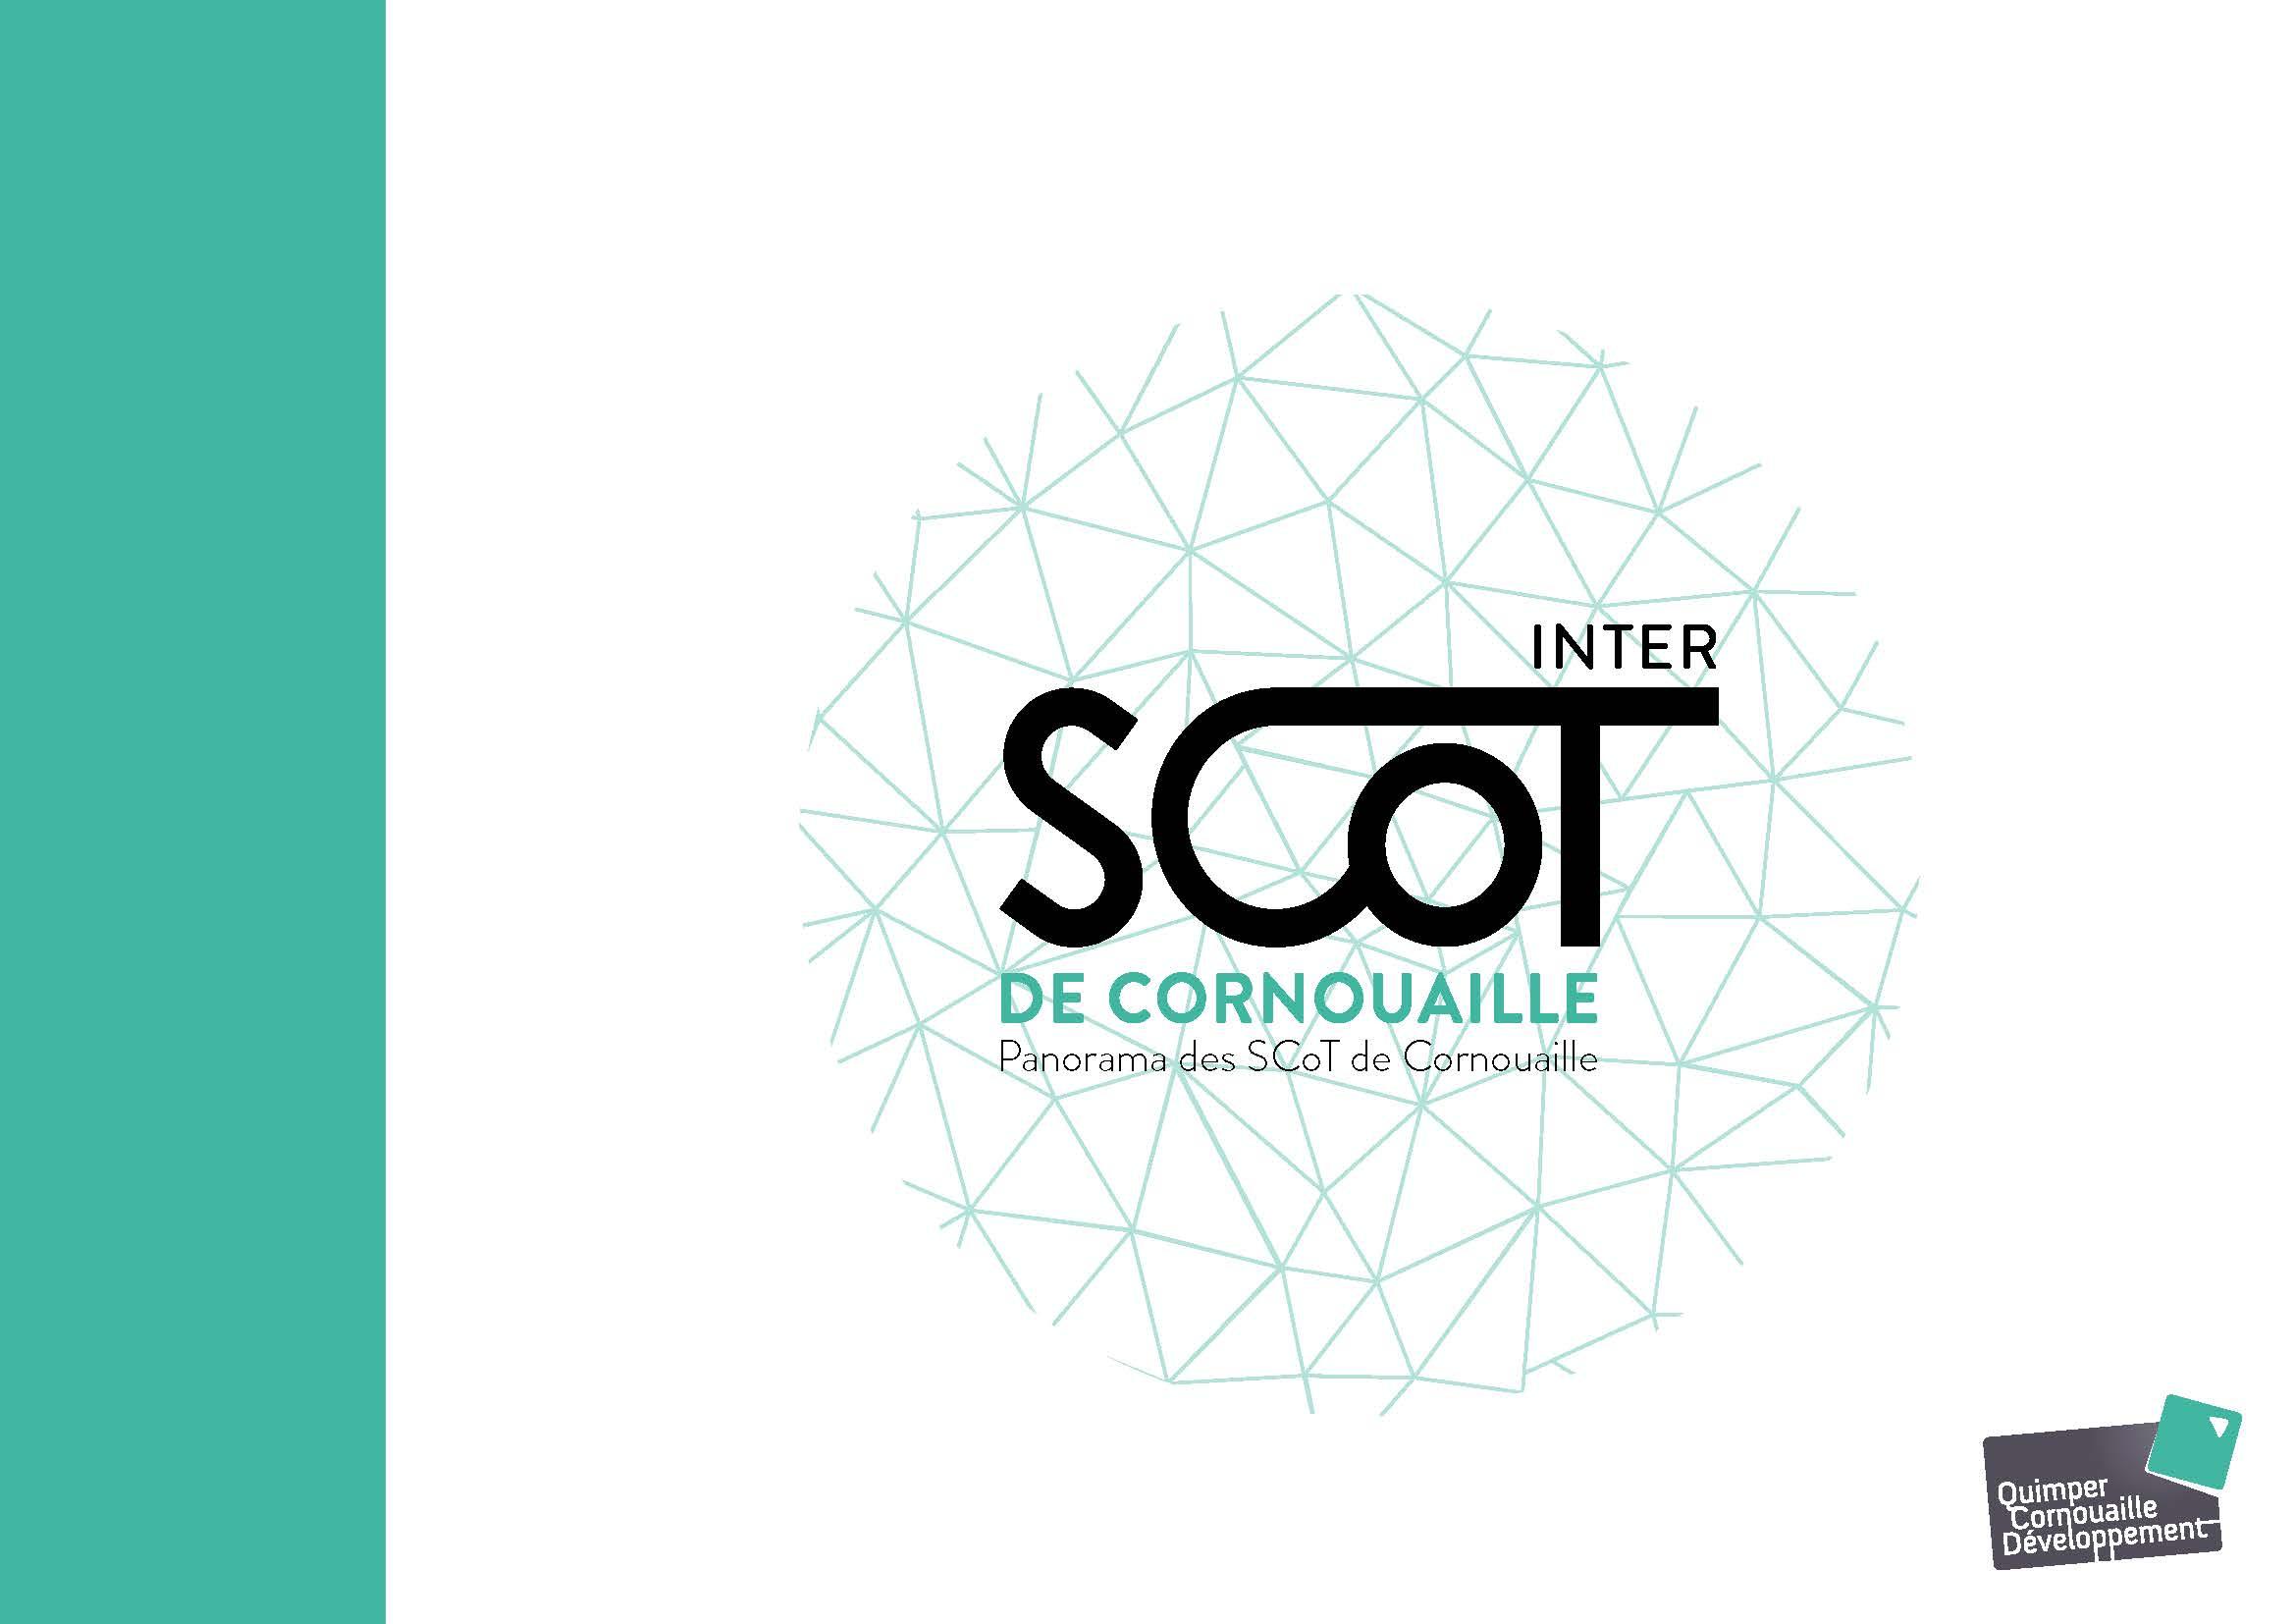 Panorama des SCoT de Cornouaille. InterSCoT de Cornouaille (avril 2017)